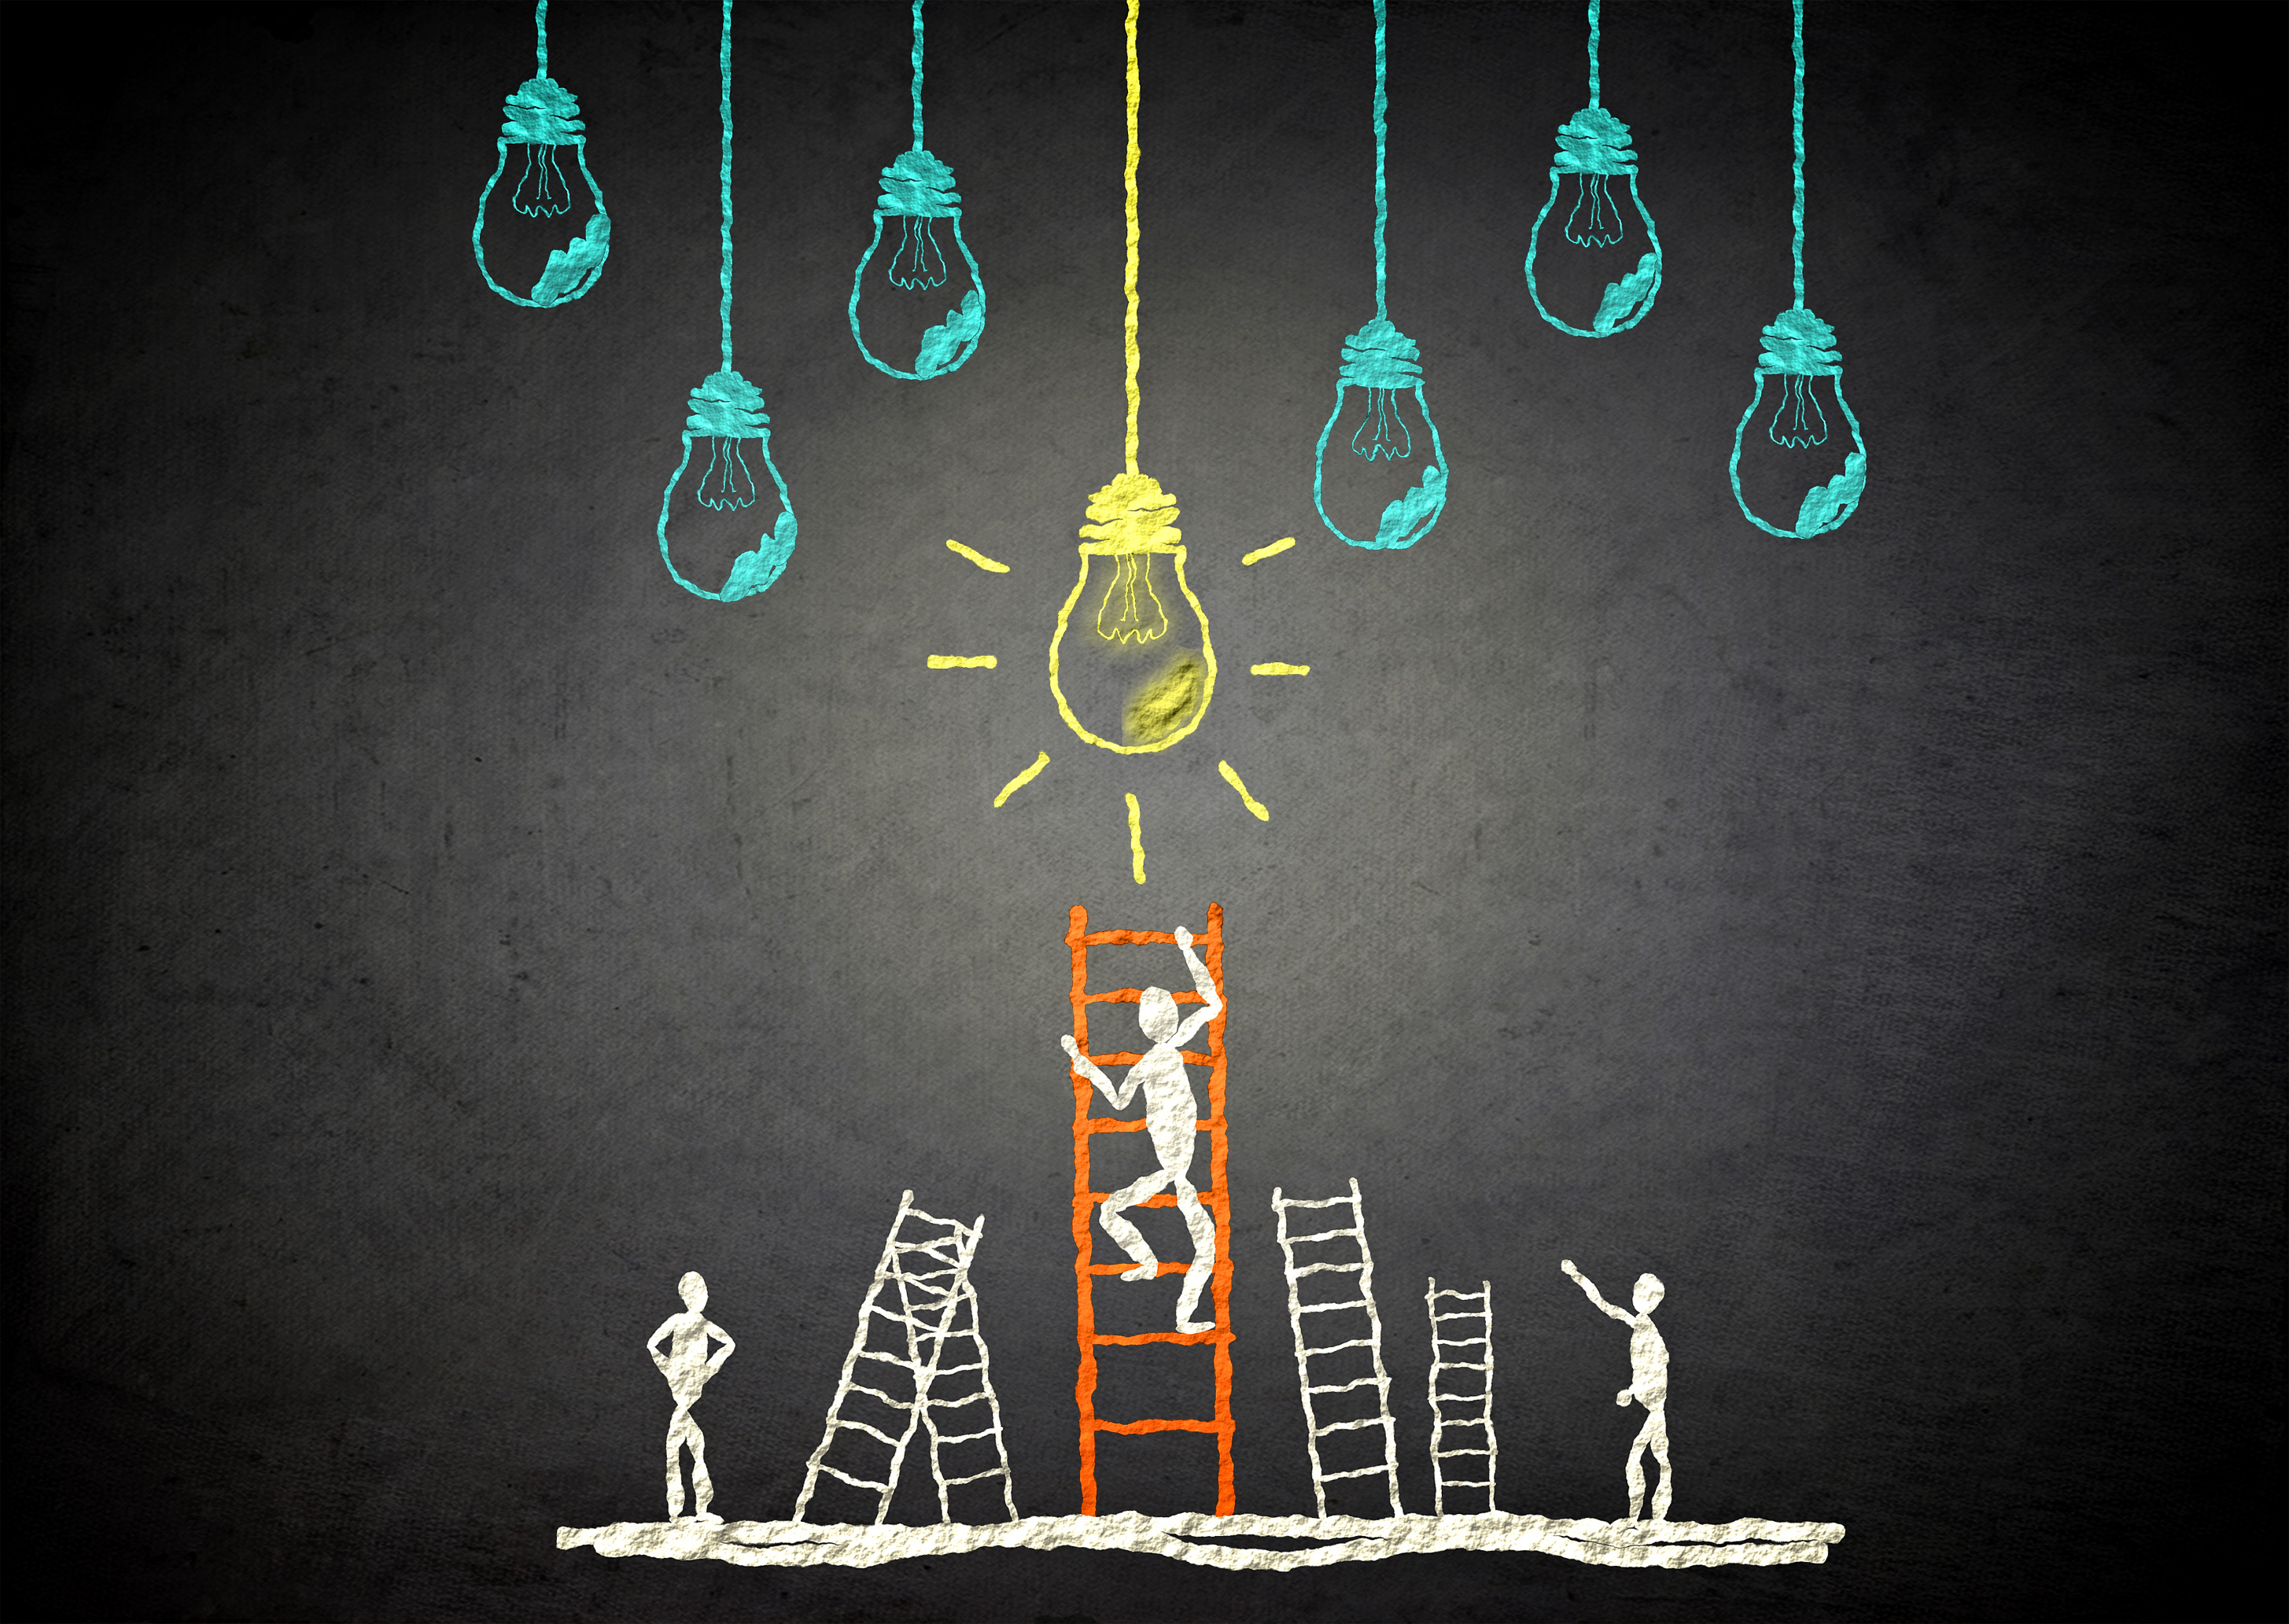 Fixing the light - Ideas and creativity concept, Alternating, Modern, Progress, Power, HQ Photo